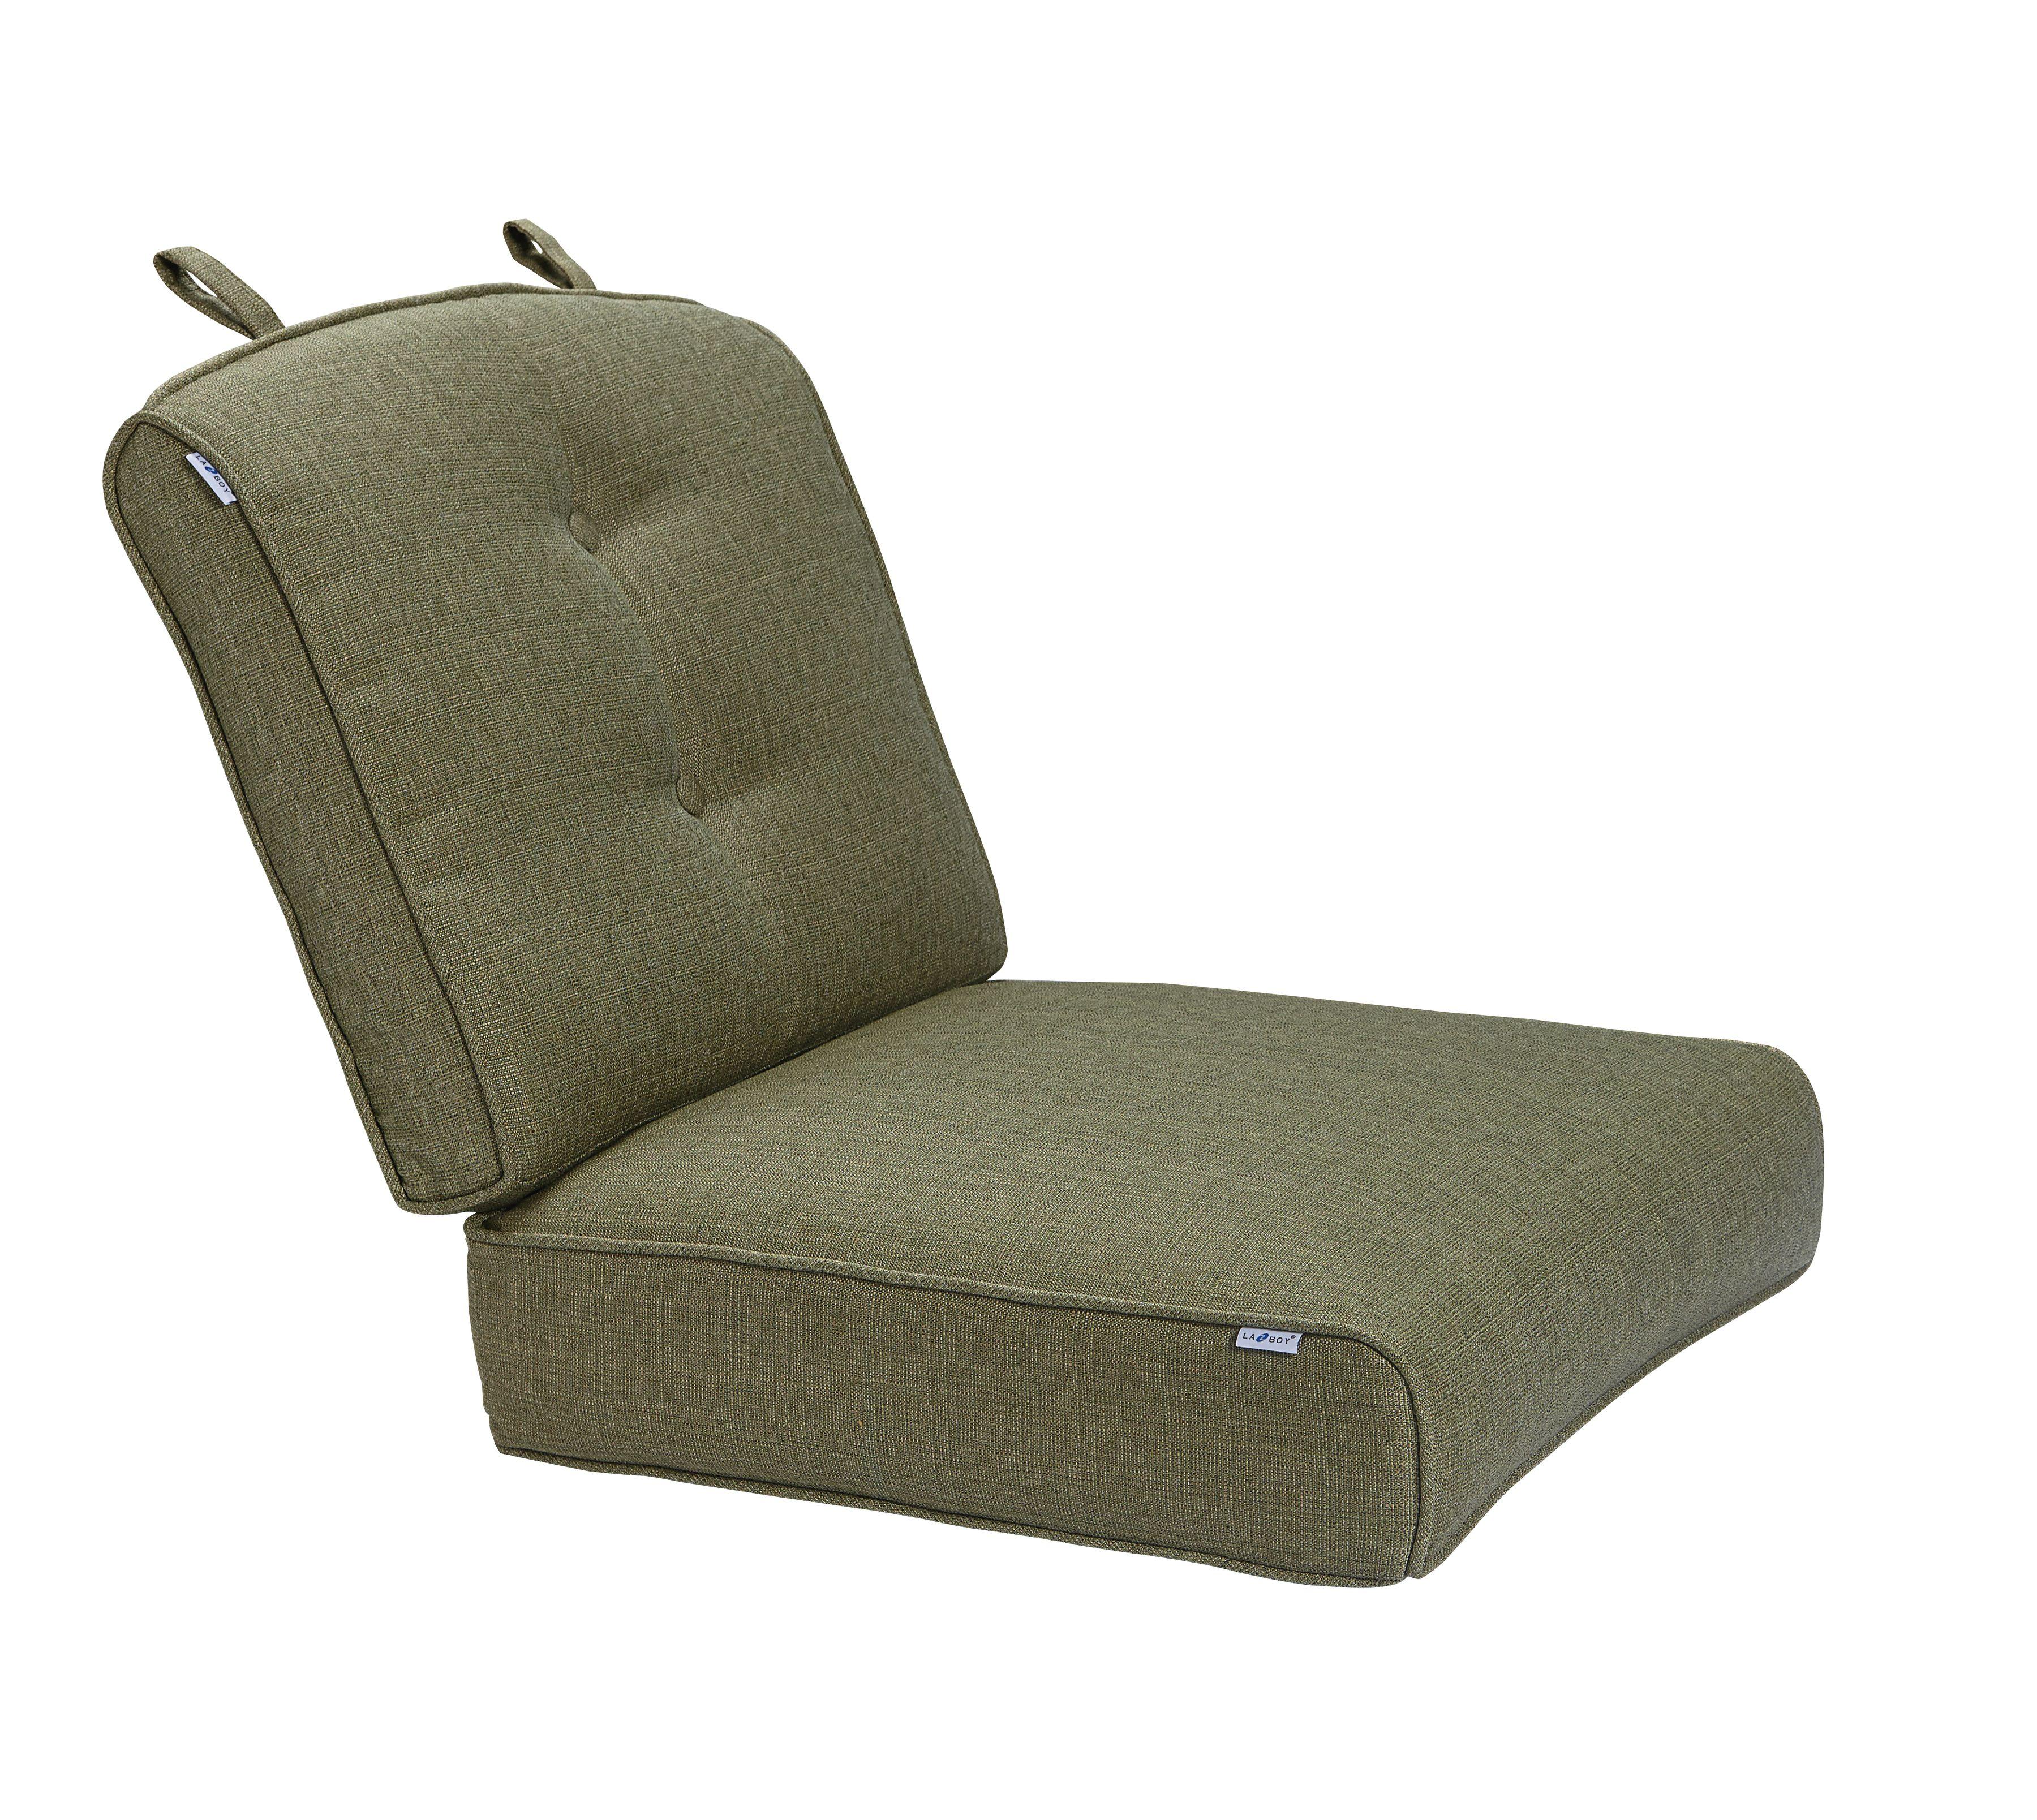 La-boy Peyton Replacement Seating Cushion - Limited